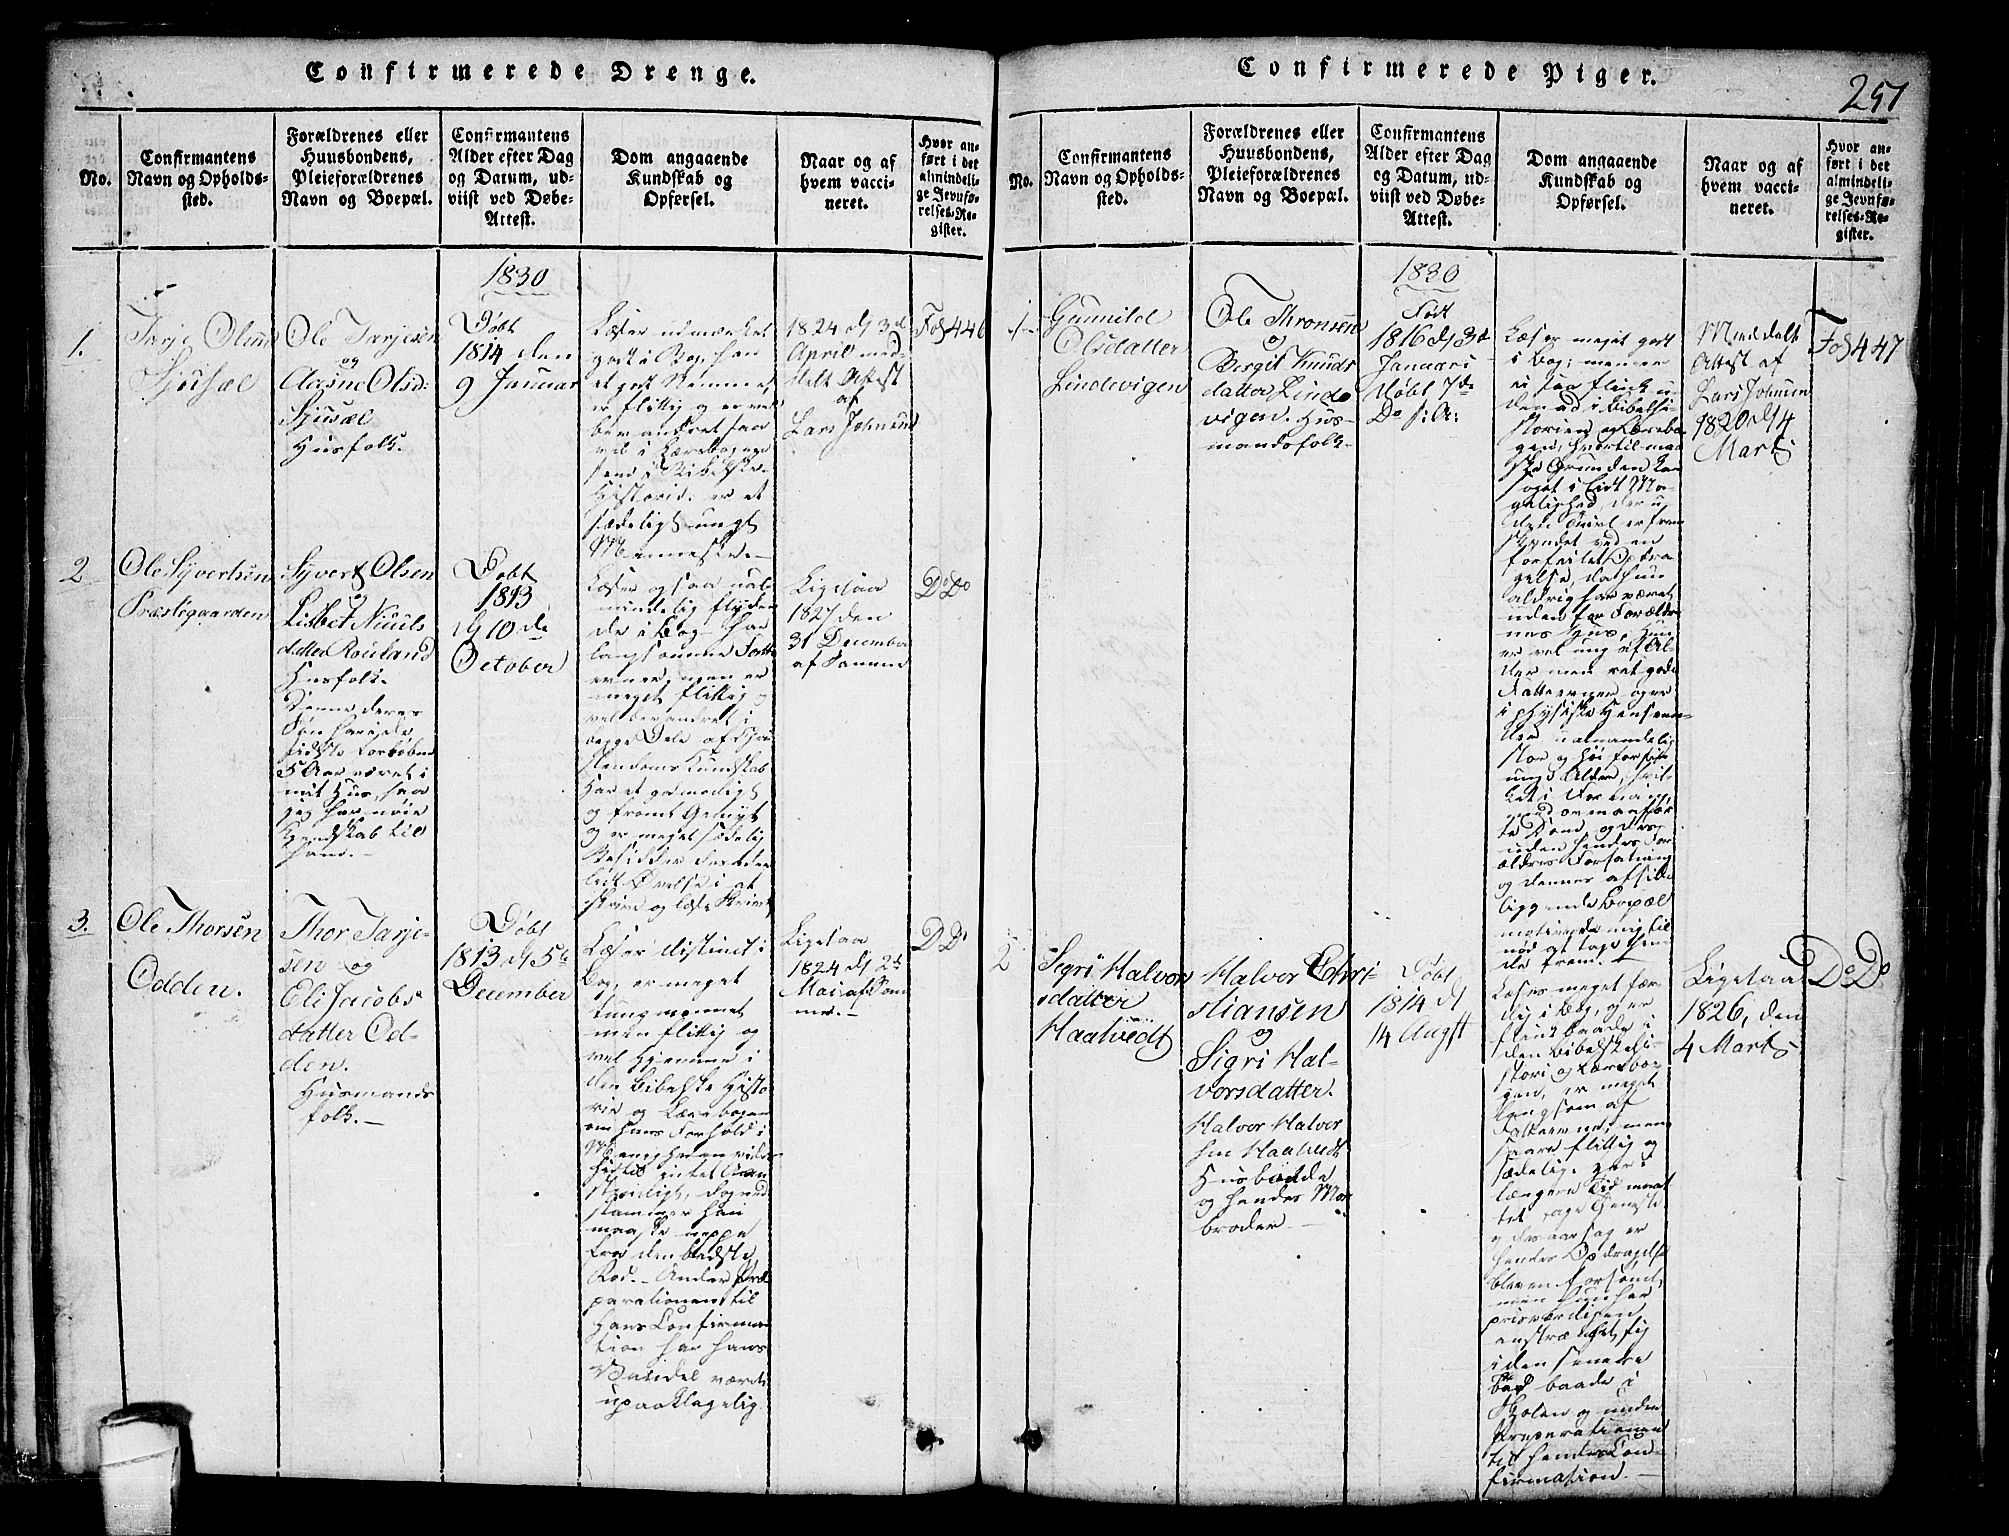 SAKO, Lårdal kirkebøker, G/Ga/L0001: Klokkerbok nr. I 1, 1815-1861, s. 251